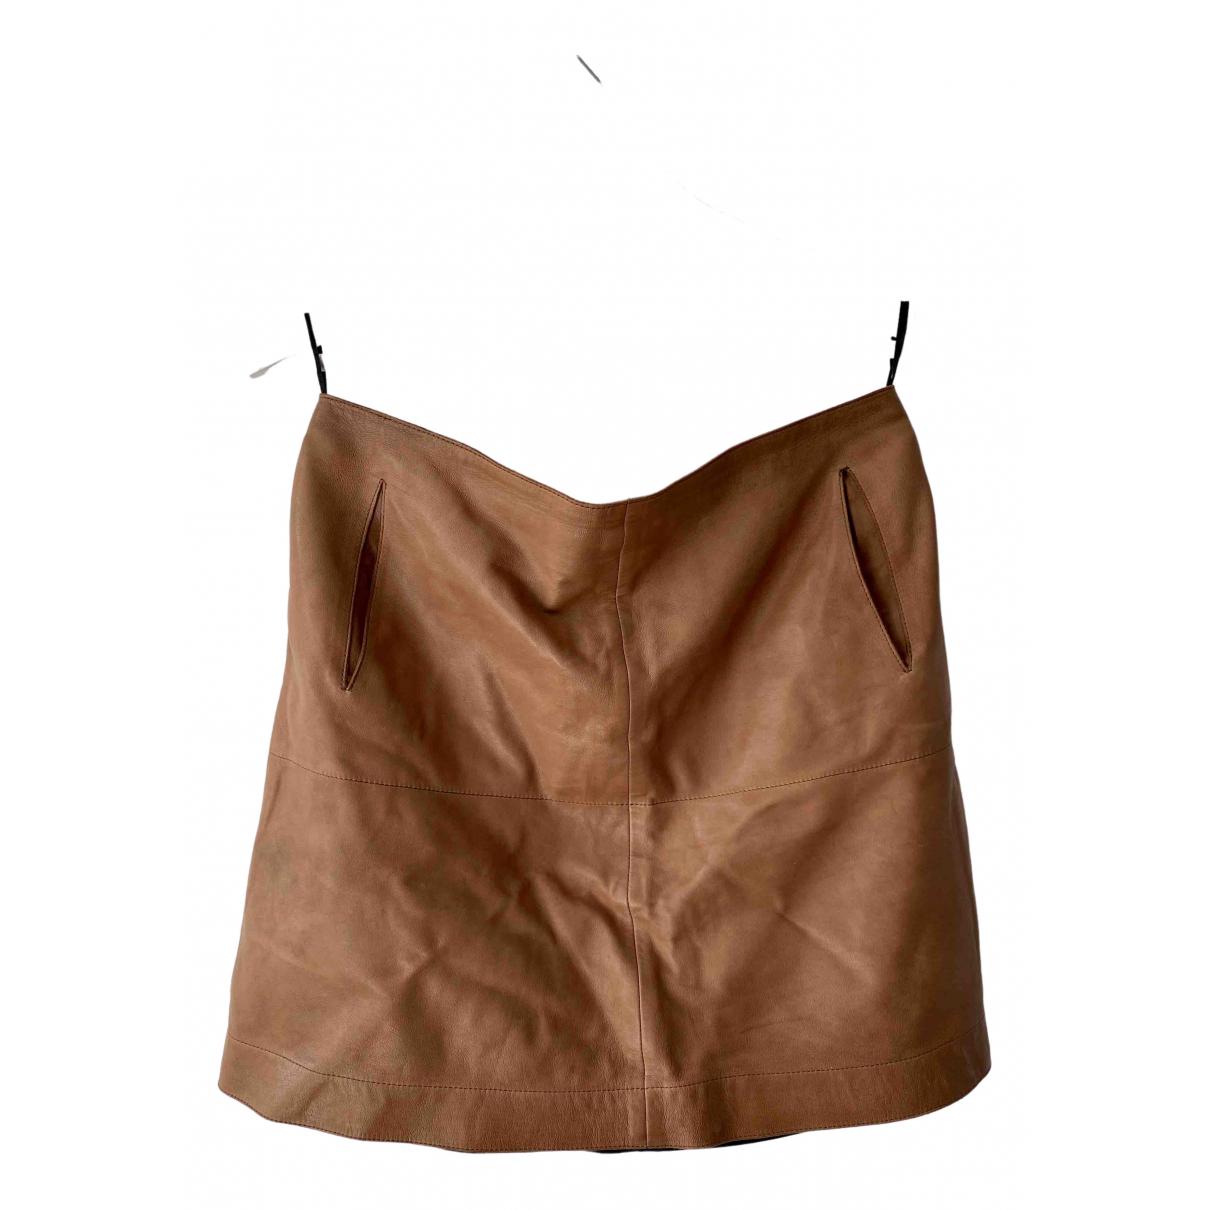 Filippa K - Jupe   pour femme en cuir - marron